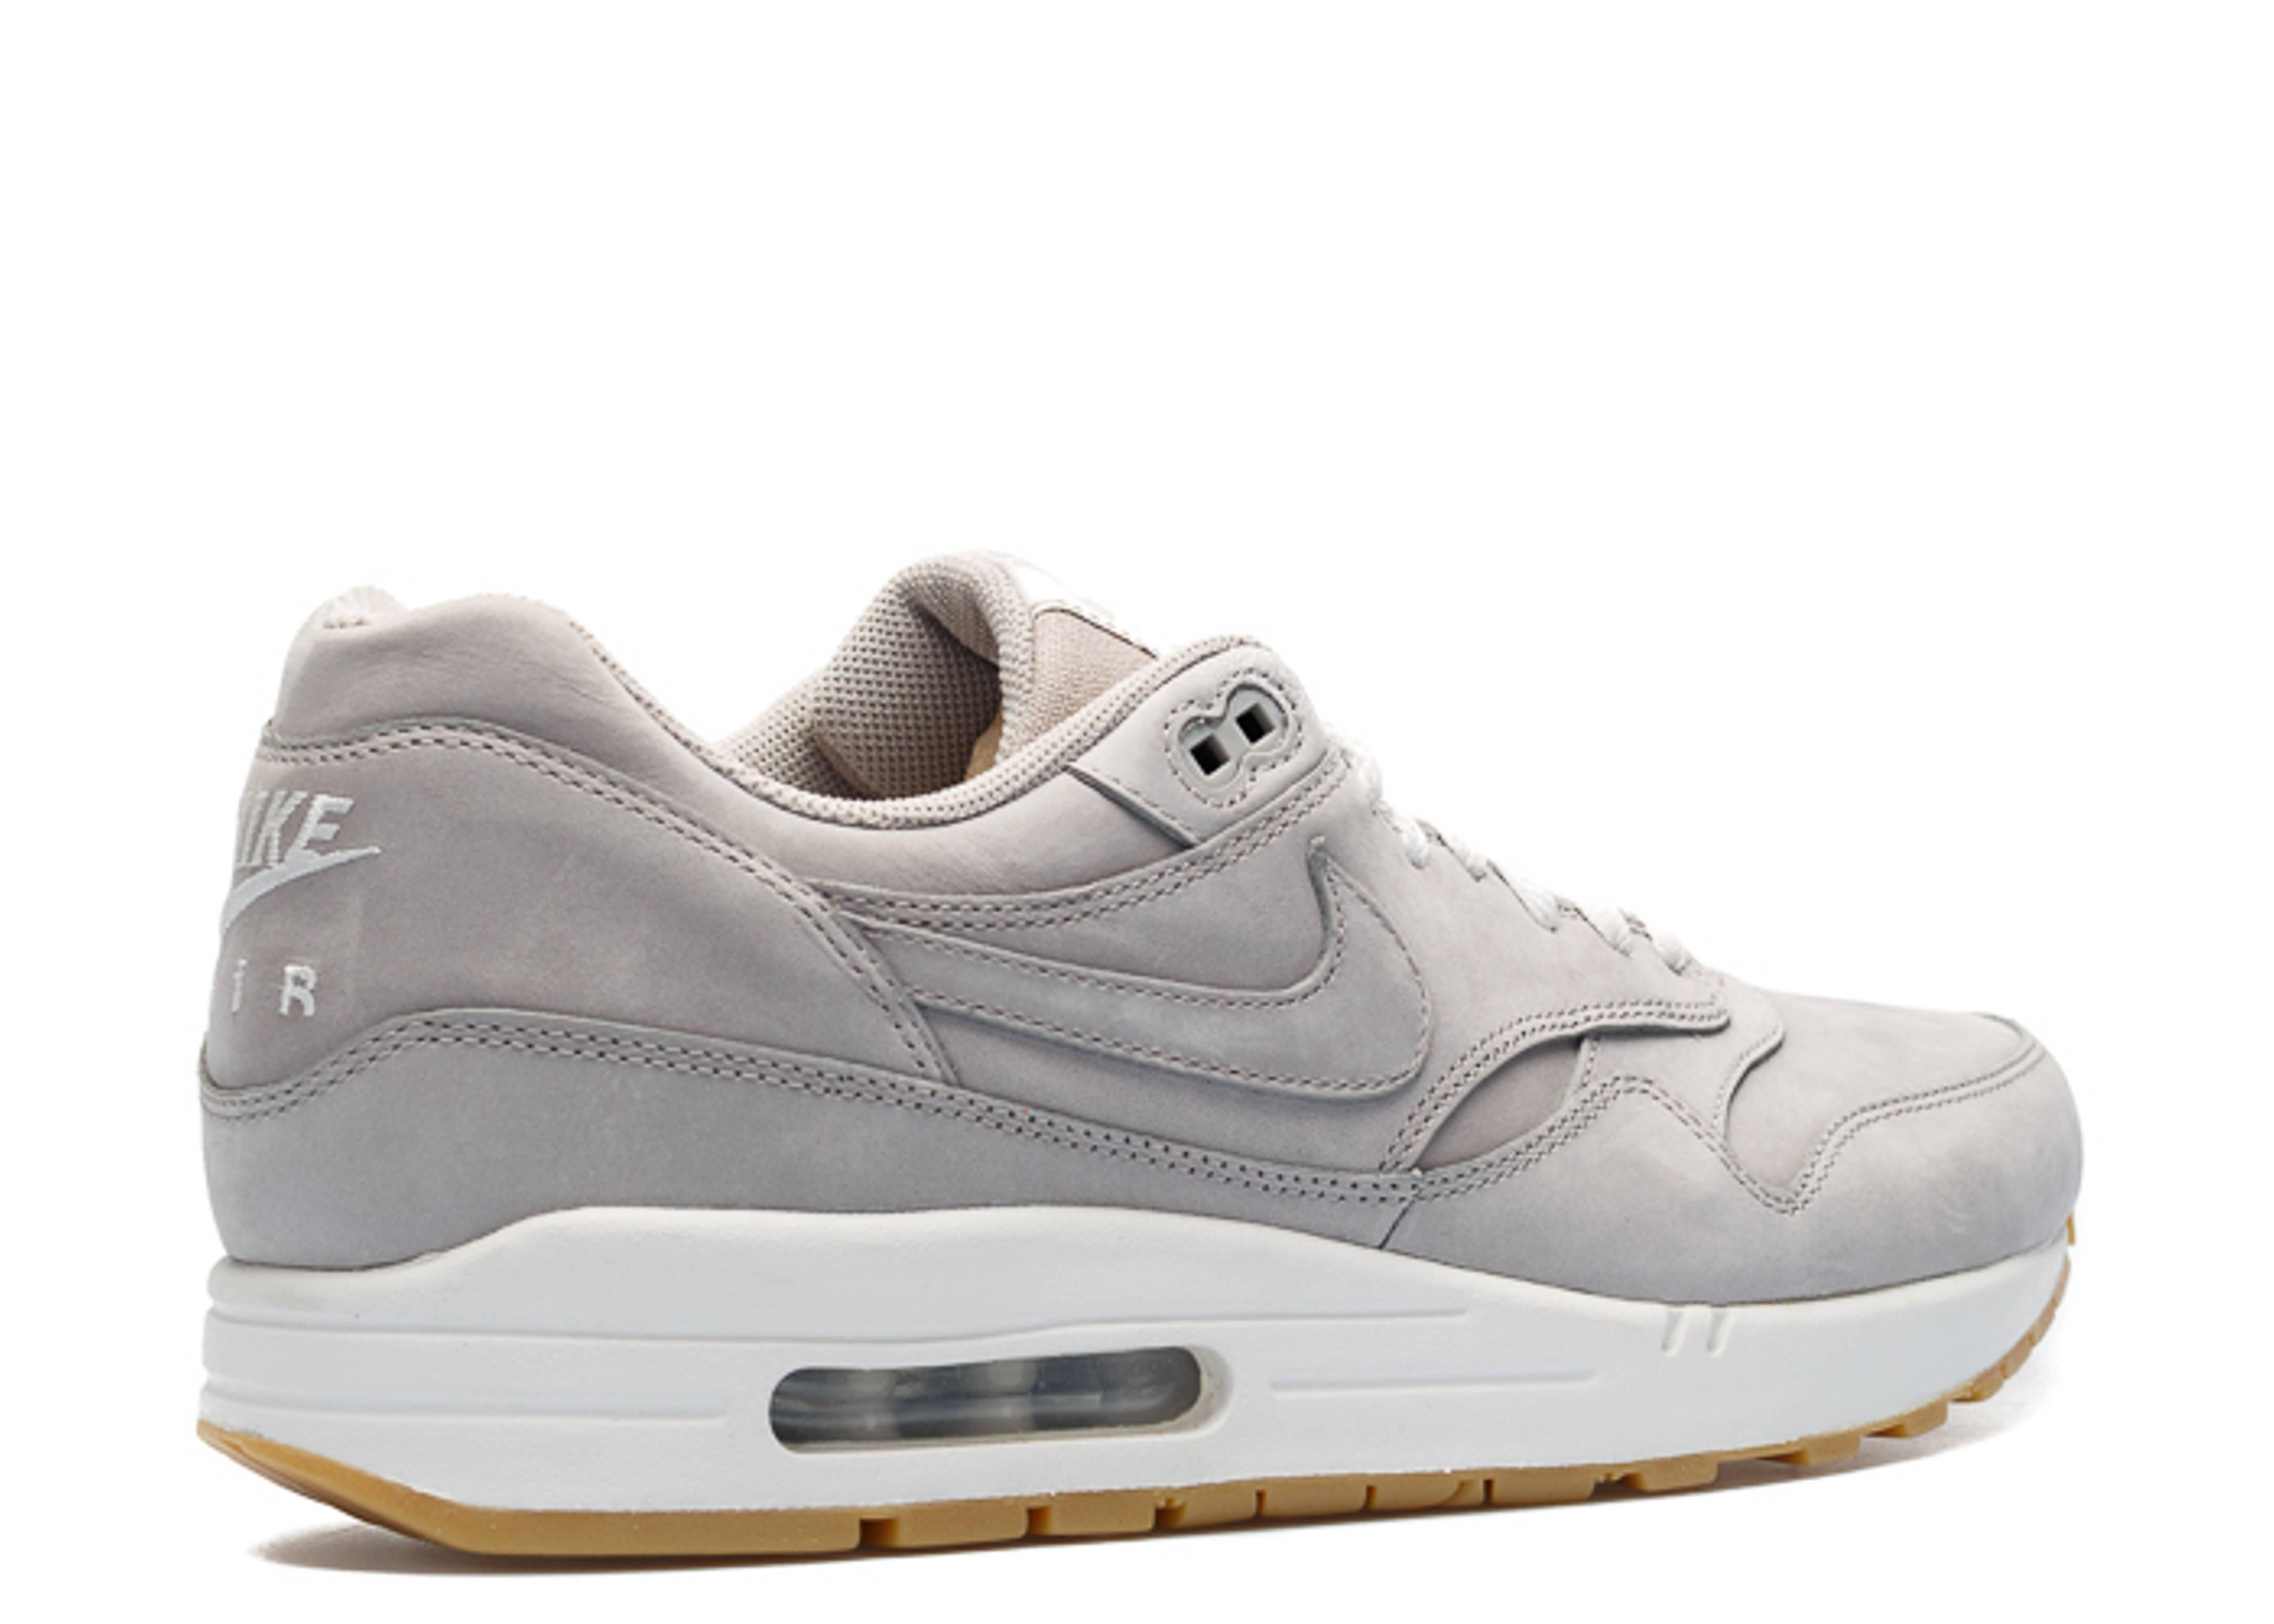 Air Max 1 Ltr Premium - Nike - 705282 005 - medium grey-mdm grey ... afe31406c